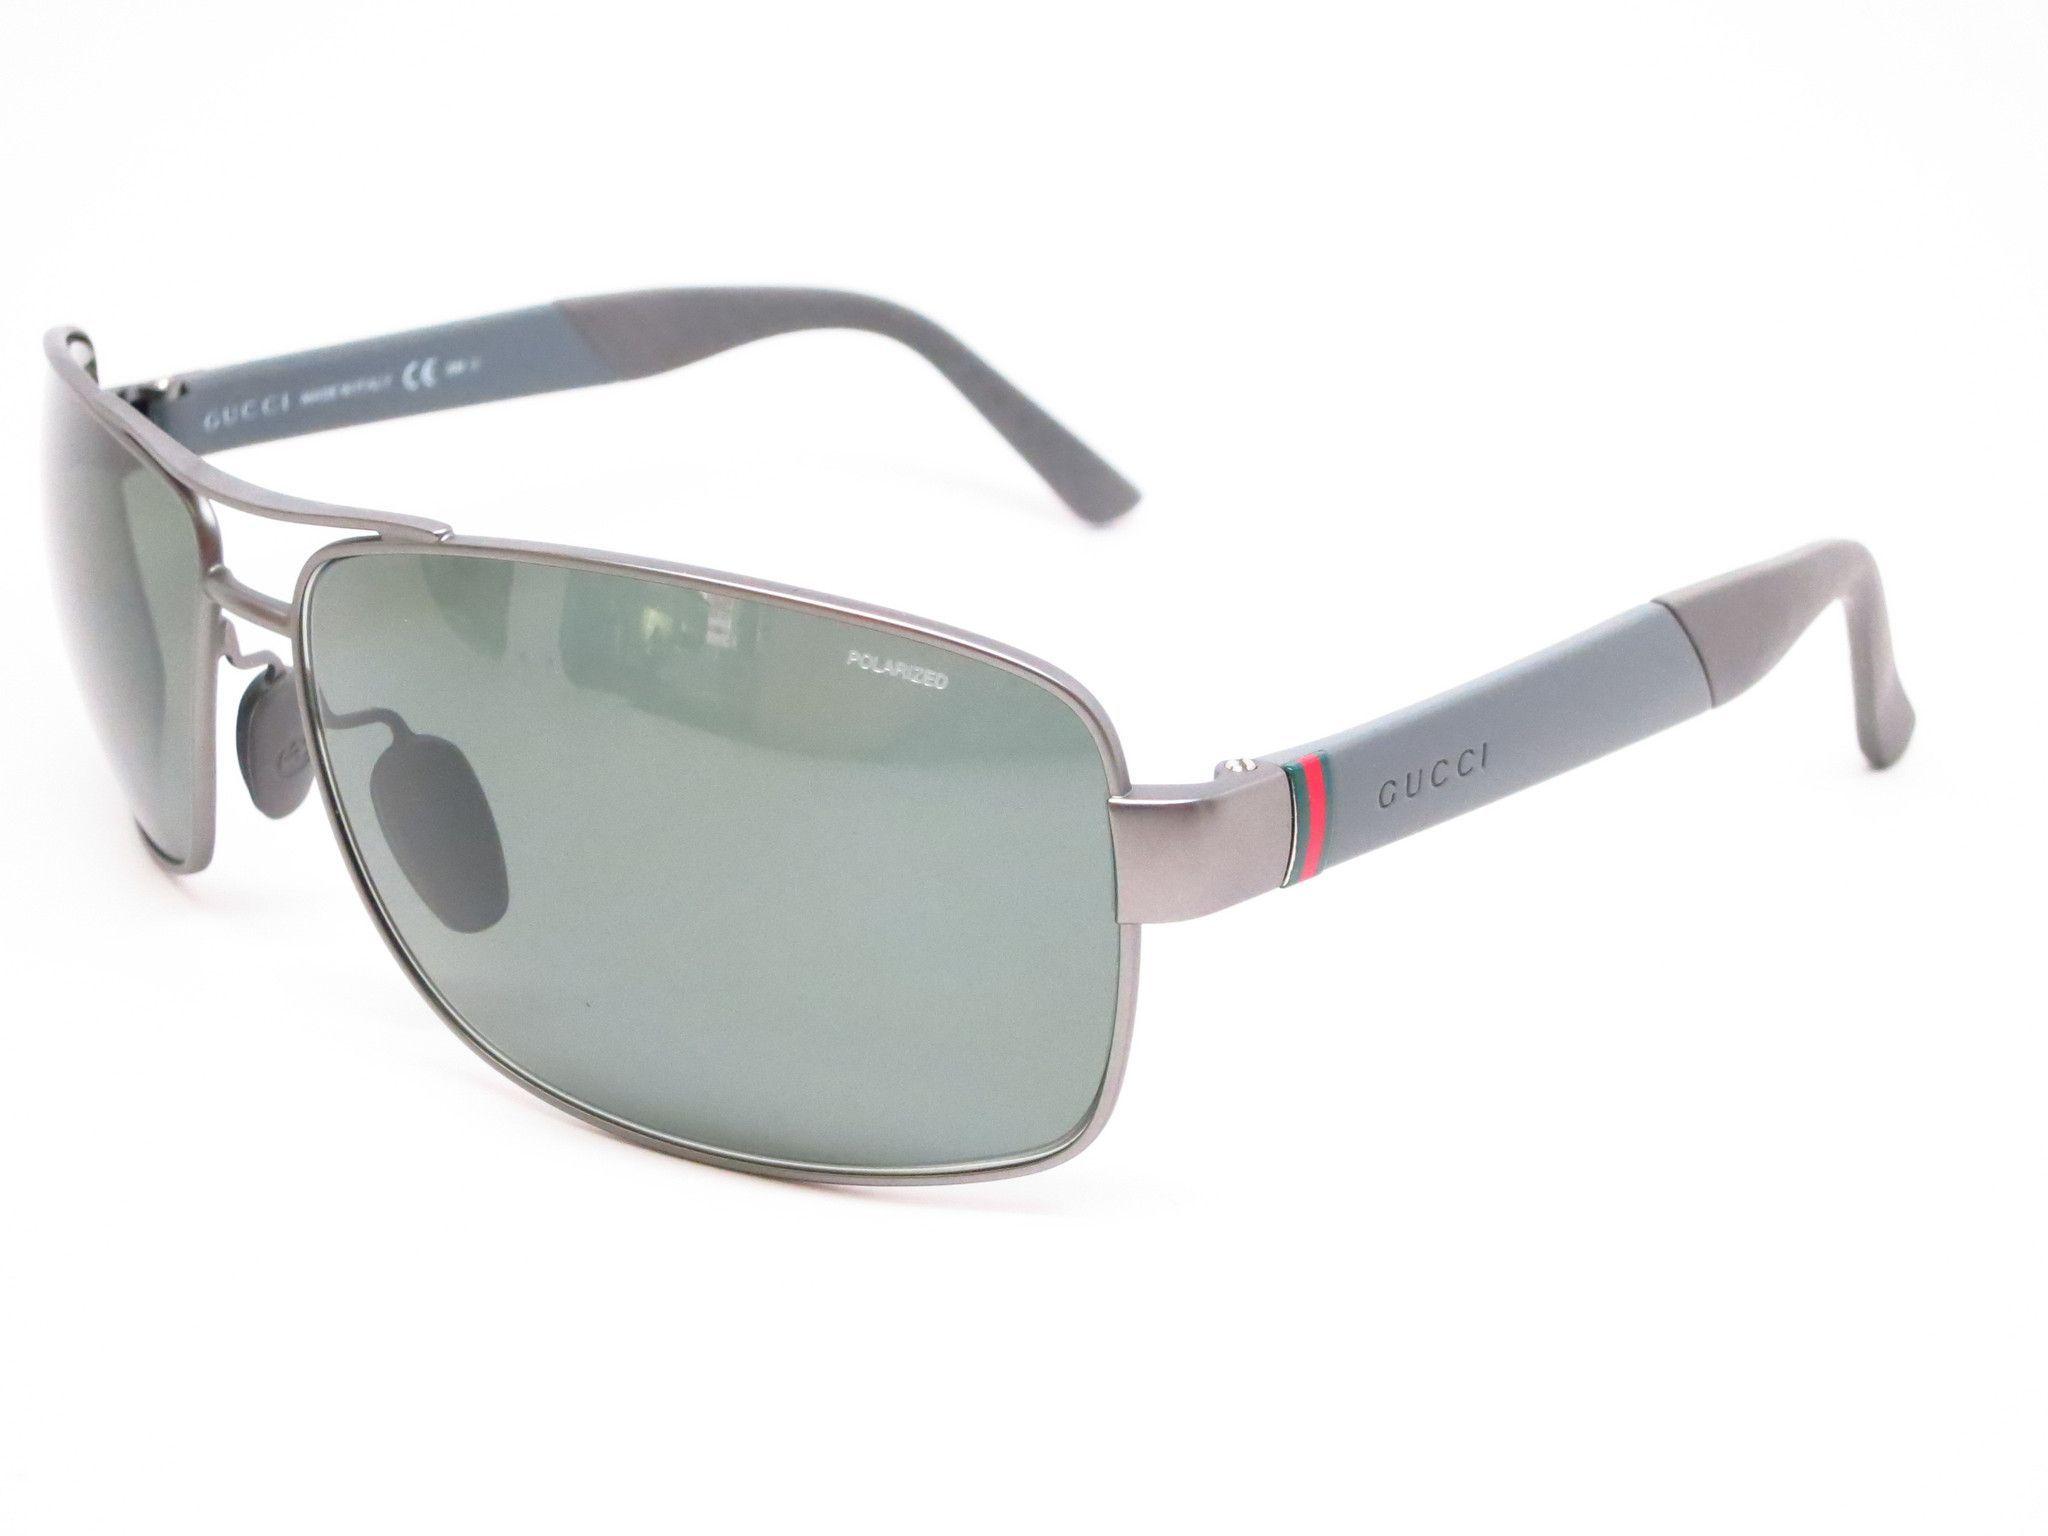 322919bb245ee Gucci GG 2234 S 8EBUC Semi Matte Dark Ruthenium Sunglasses